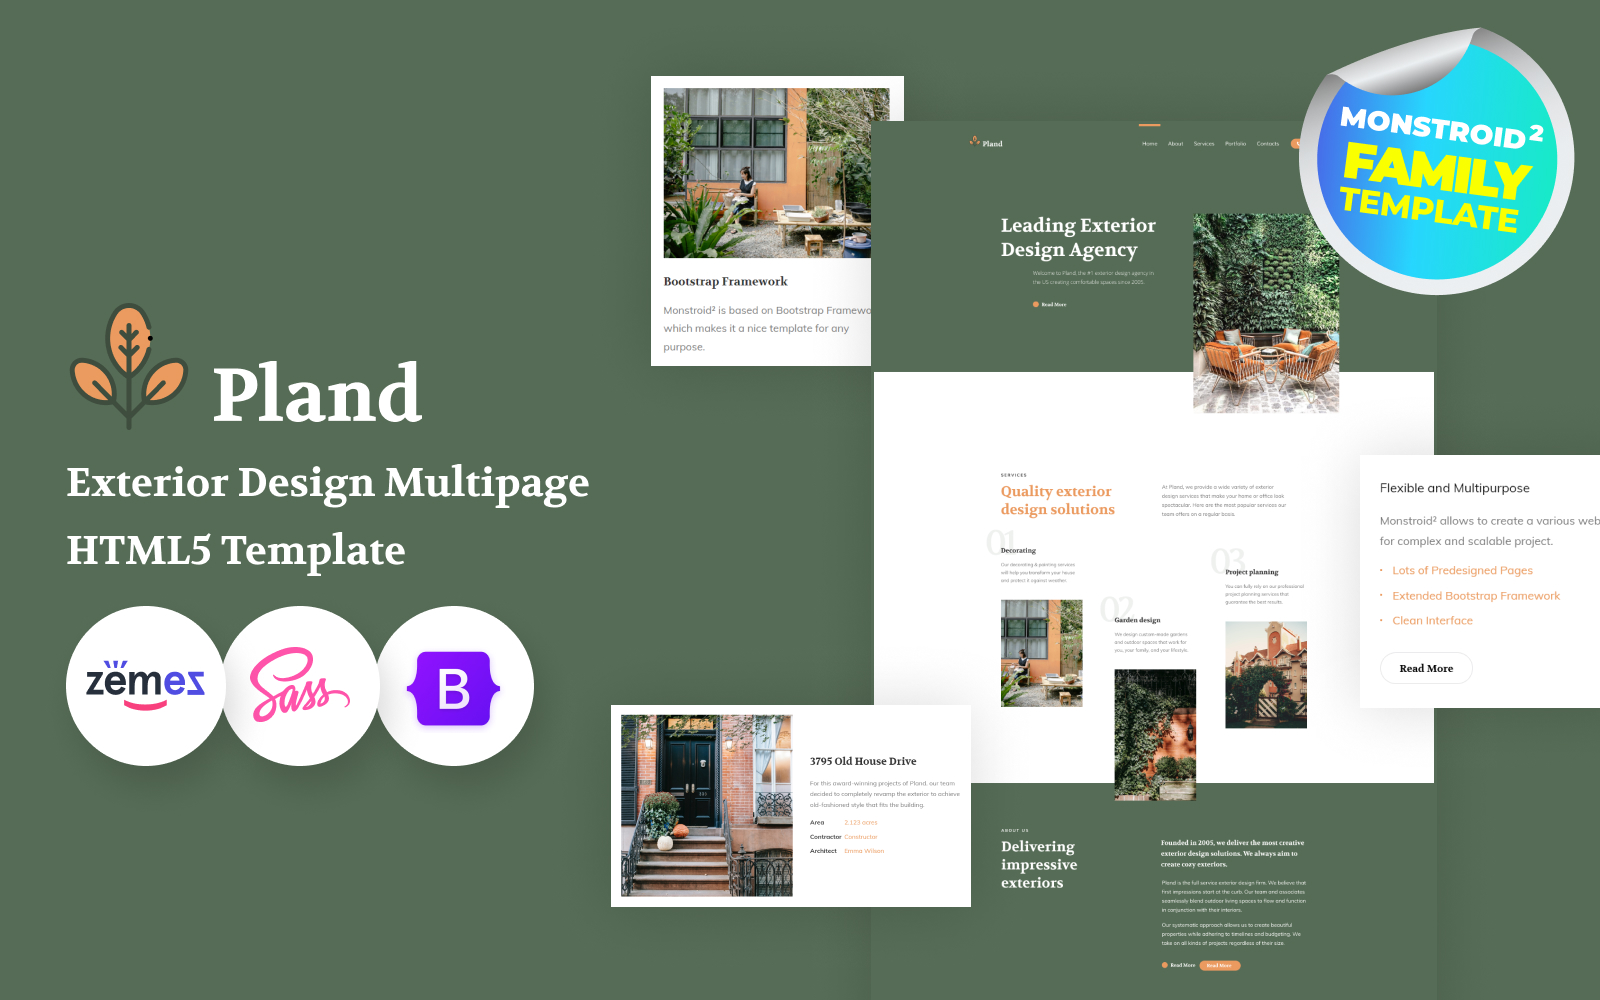 Pland - Exterior Design Studio Website Template